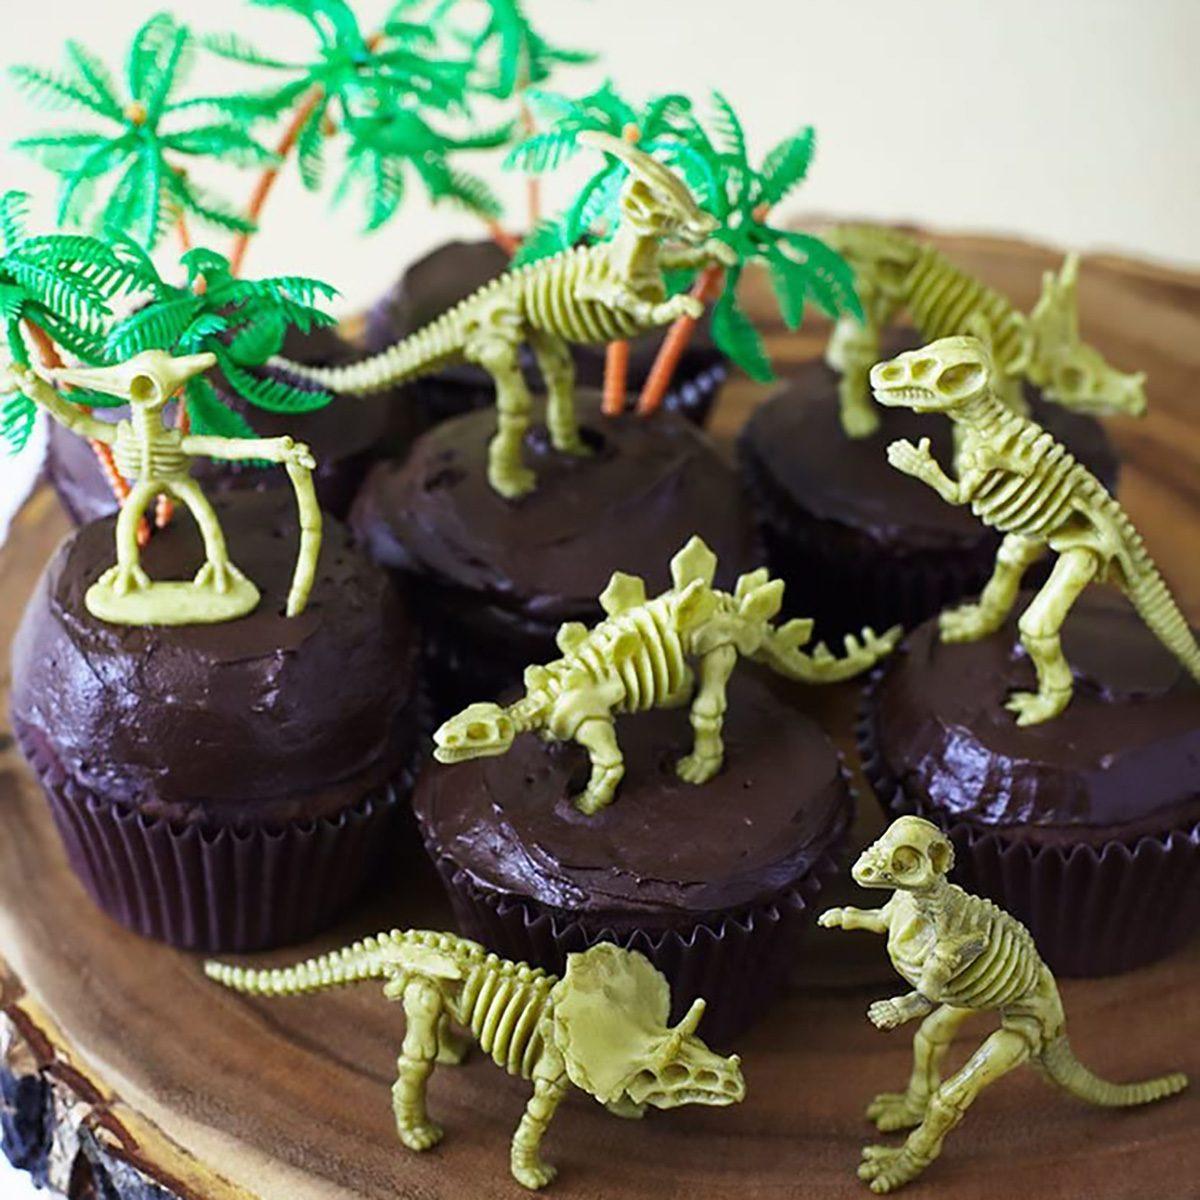 "Cakegirls (24) Dinosaur Bones Cupcake Toppers Kit - (12) 3 1/2"" Dinosaur Skeletons Fossils Assorted T-Rex, Triceratops, Stegosaurus (12) 3"" Palm Trees (30) Brown Grease Proof Cupcake Liners"